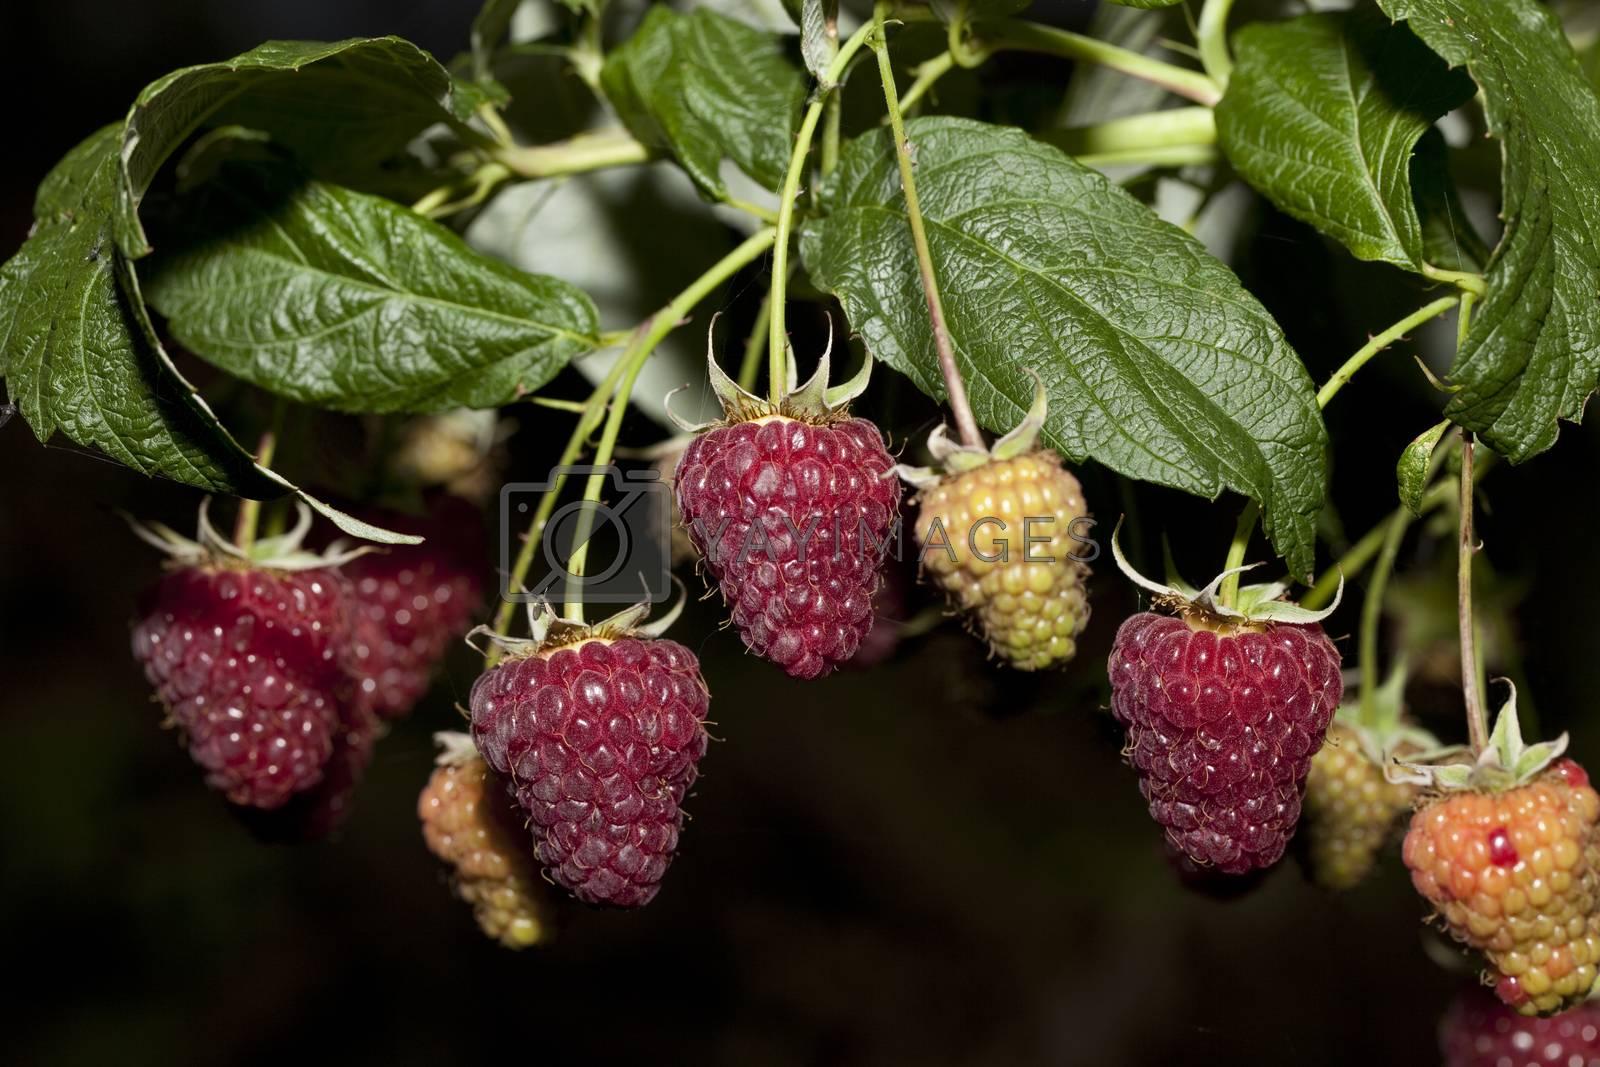 ripe and unripe raspberry (Rubus idaeus) on bush